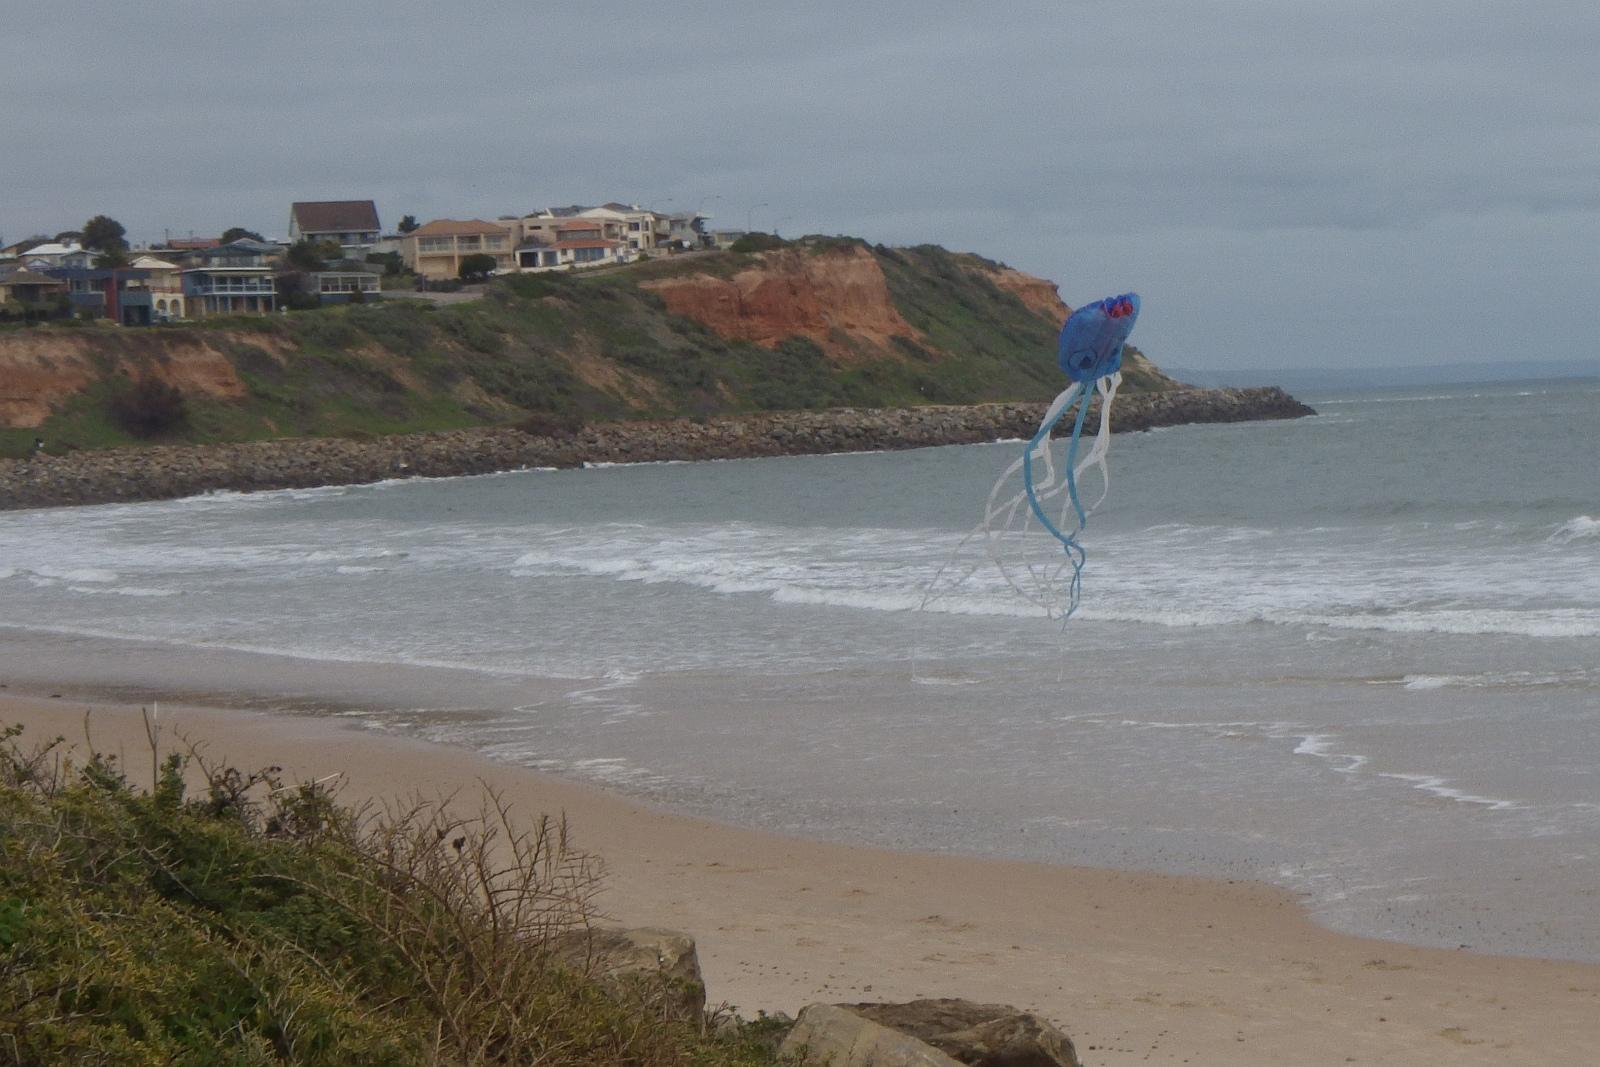 MBK Octopus kite 1 - 5.